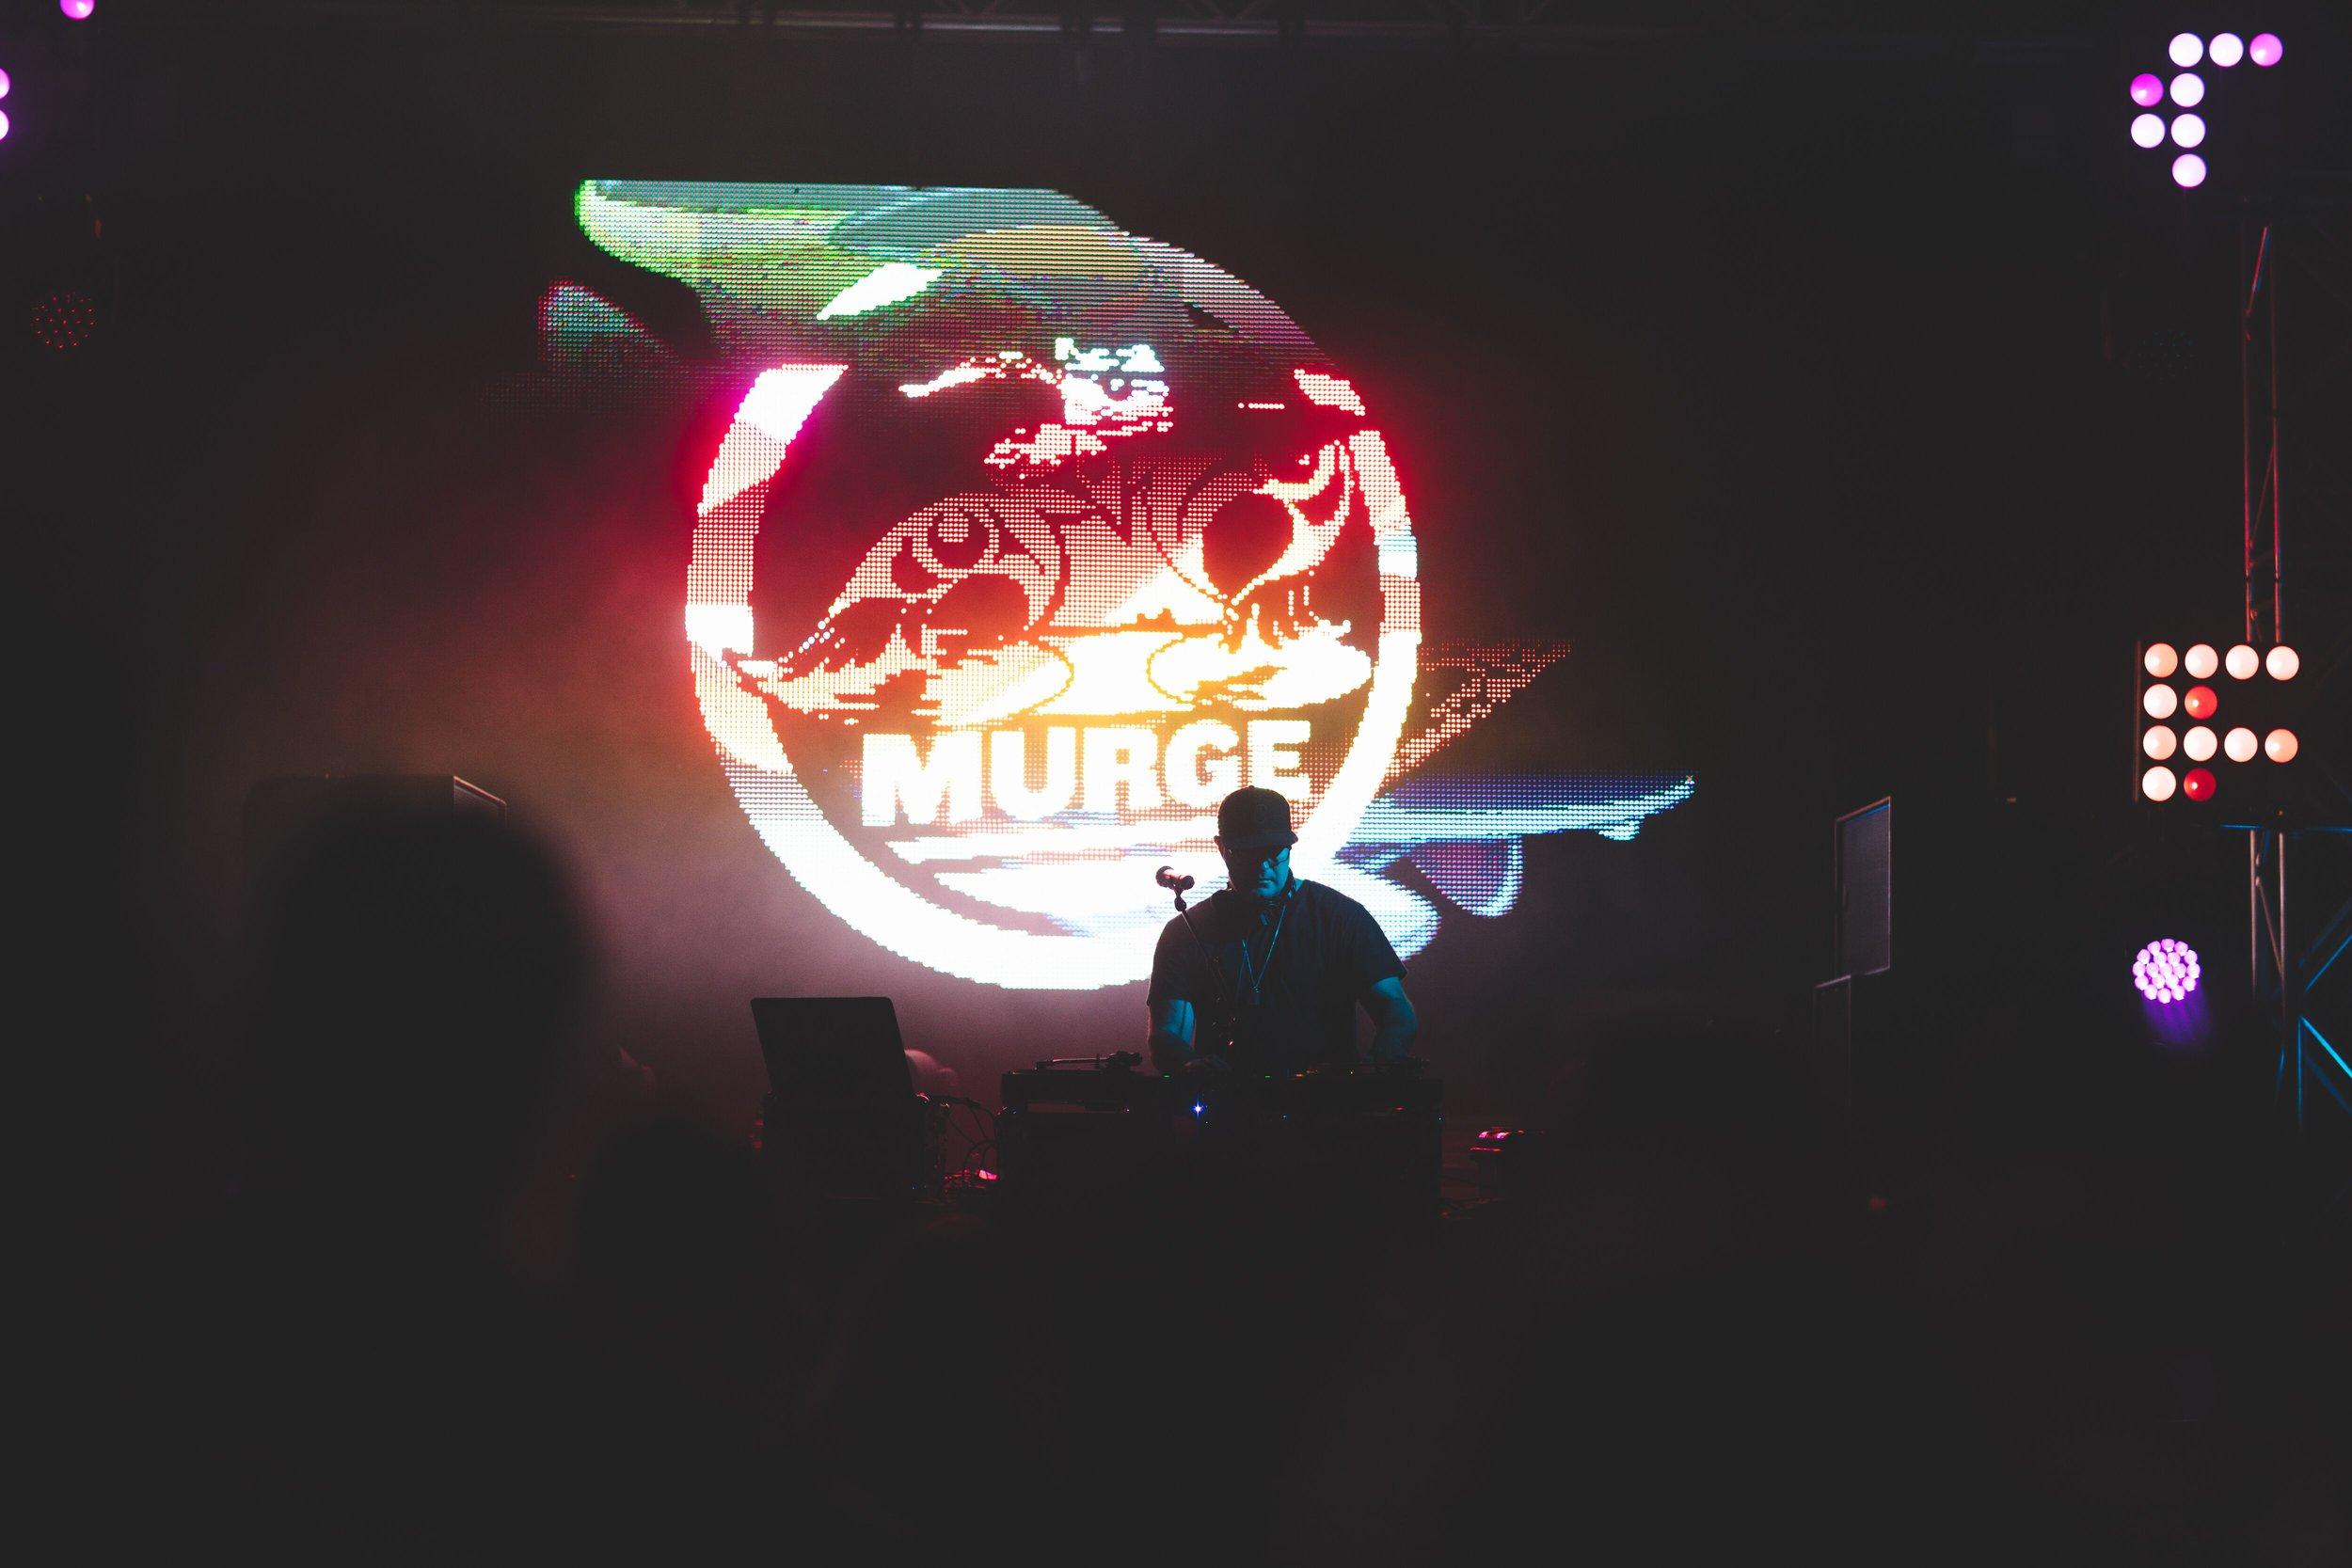 dj+murge+riff+son+surf+xavier+walker+2017.jpeg